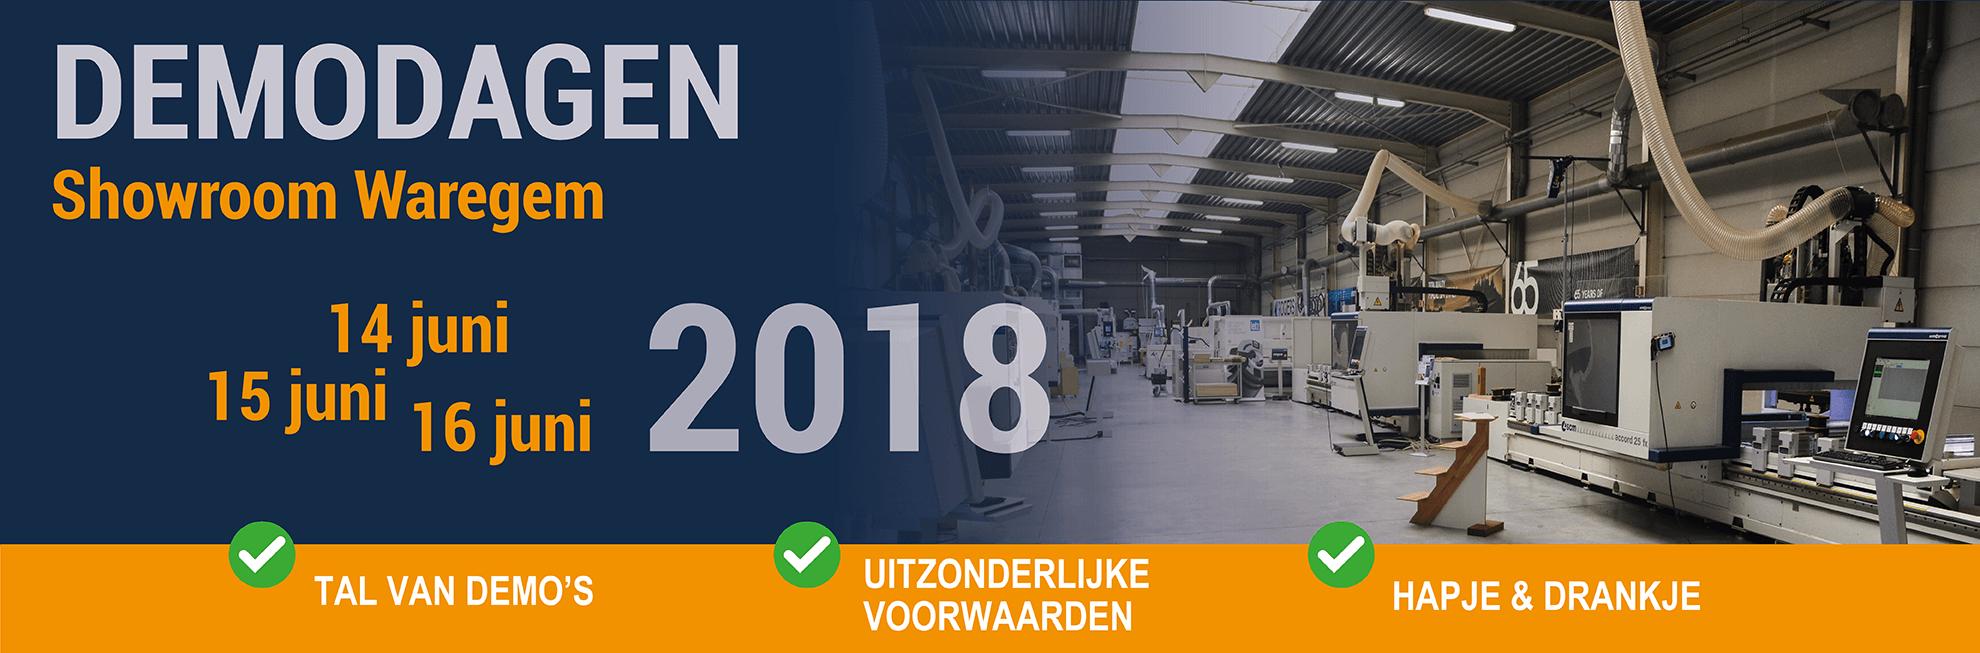 Banner Demodagen Waregem NL.png